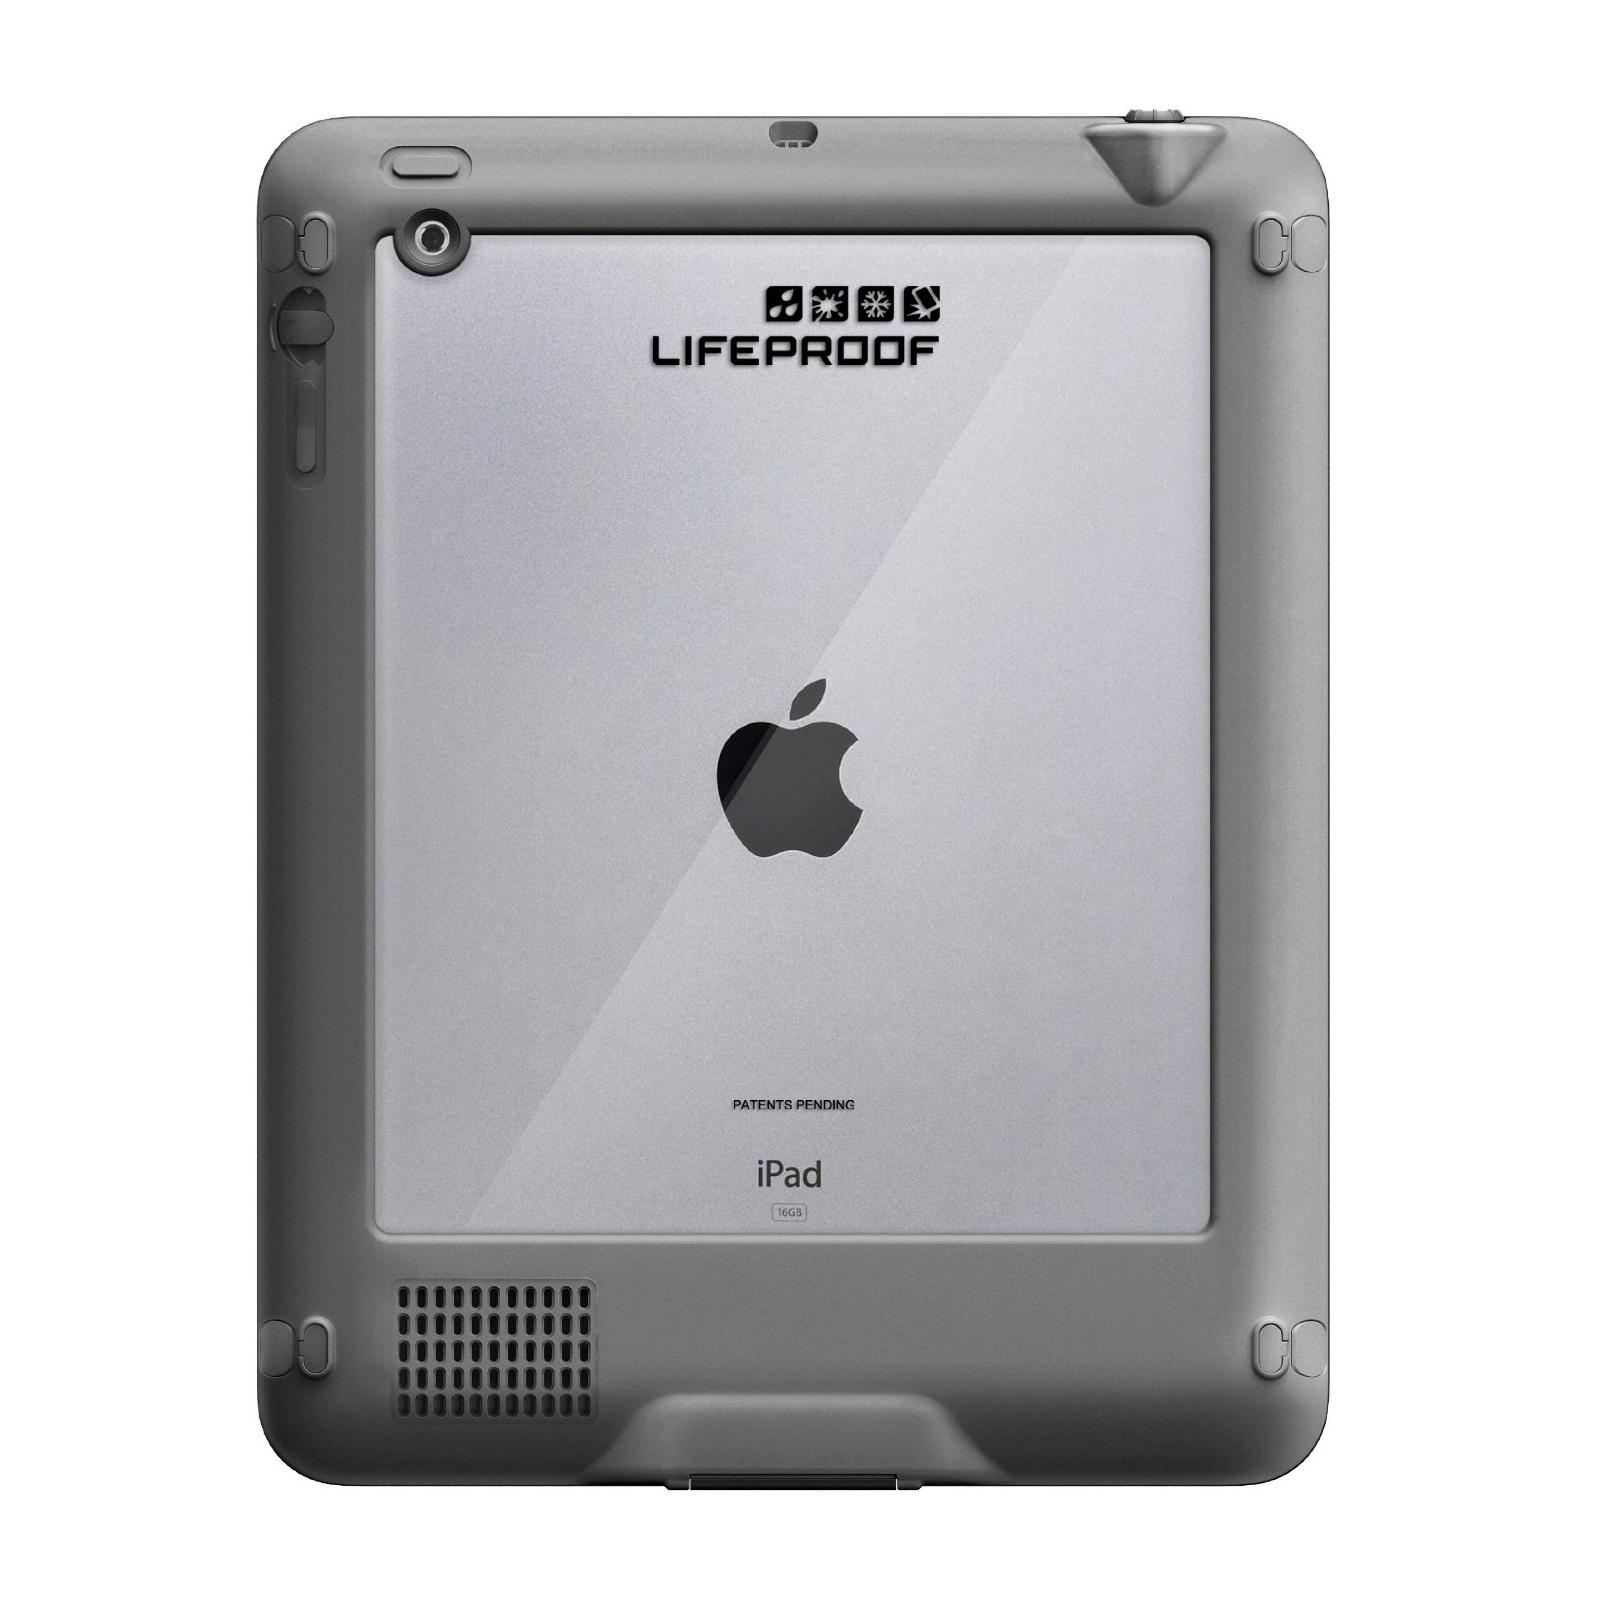 Чехол для планшета Belkin iPad4 LifeProof Case & Cover/Stand (1109-02) изображение 2